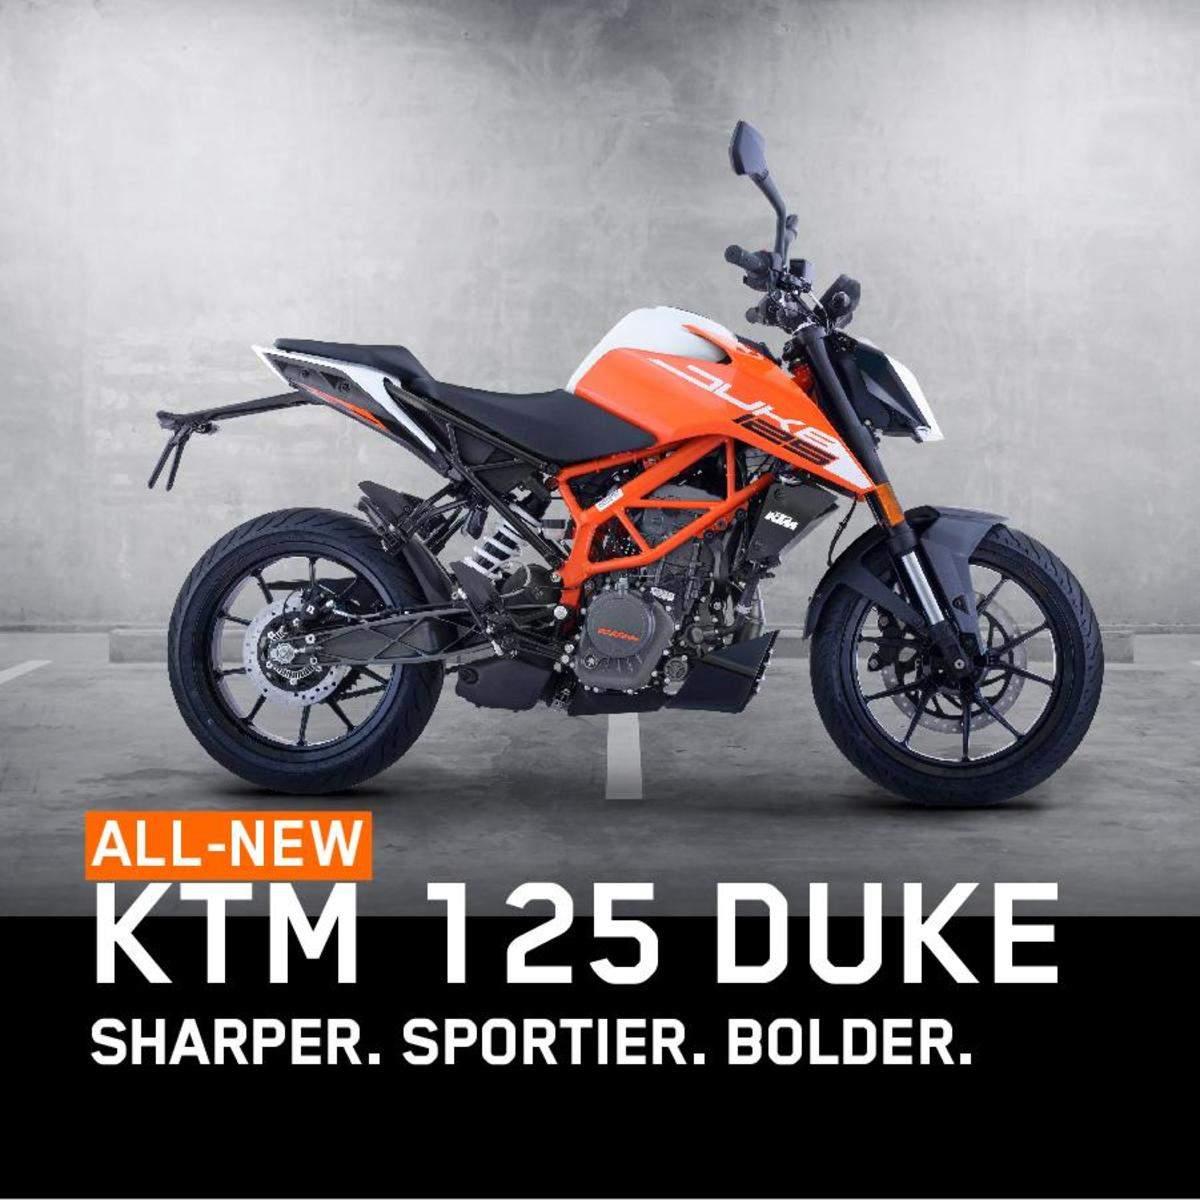 Duke 2022 Calendar.Ktm 125 Duke Ktm Launches Ktm 125 Duke At Introductory Price Of Inr 1 5 Lakh Auto News Et Auto